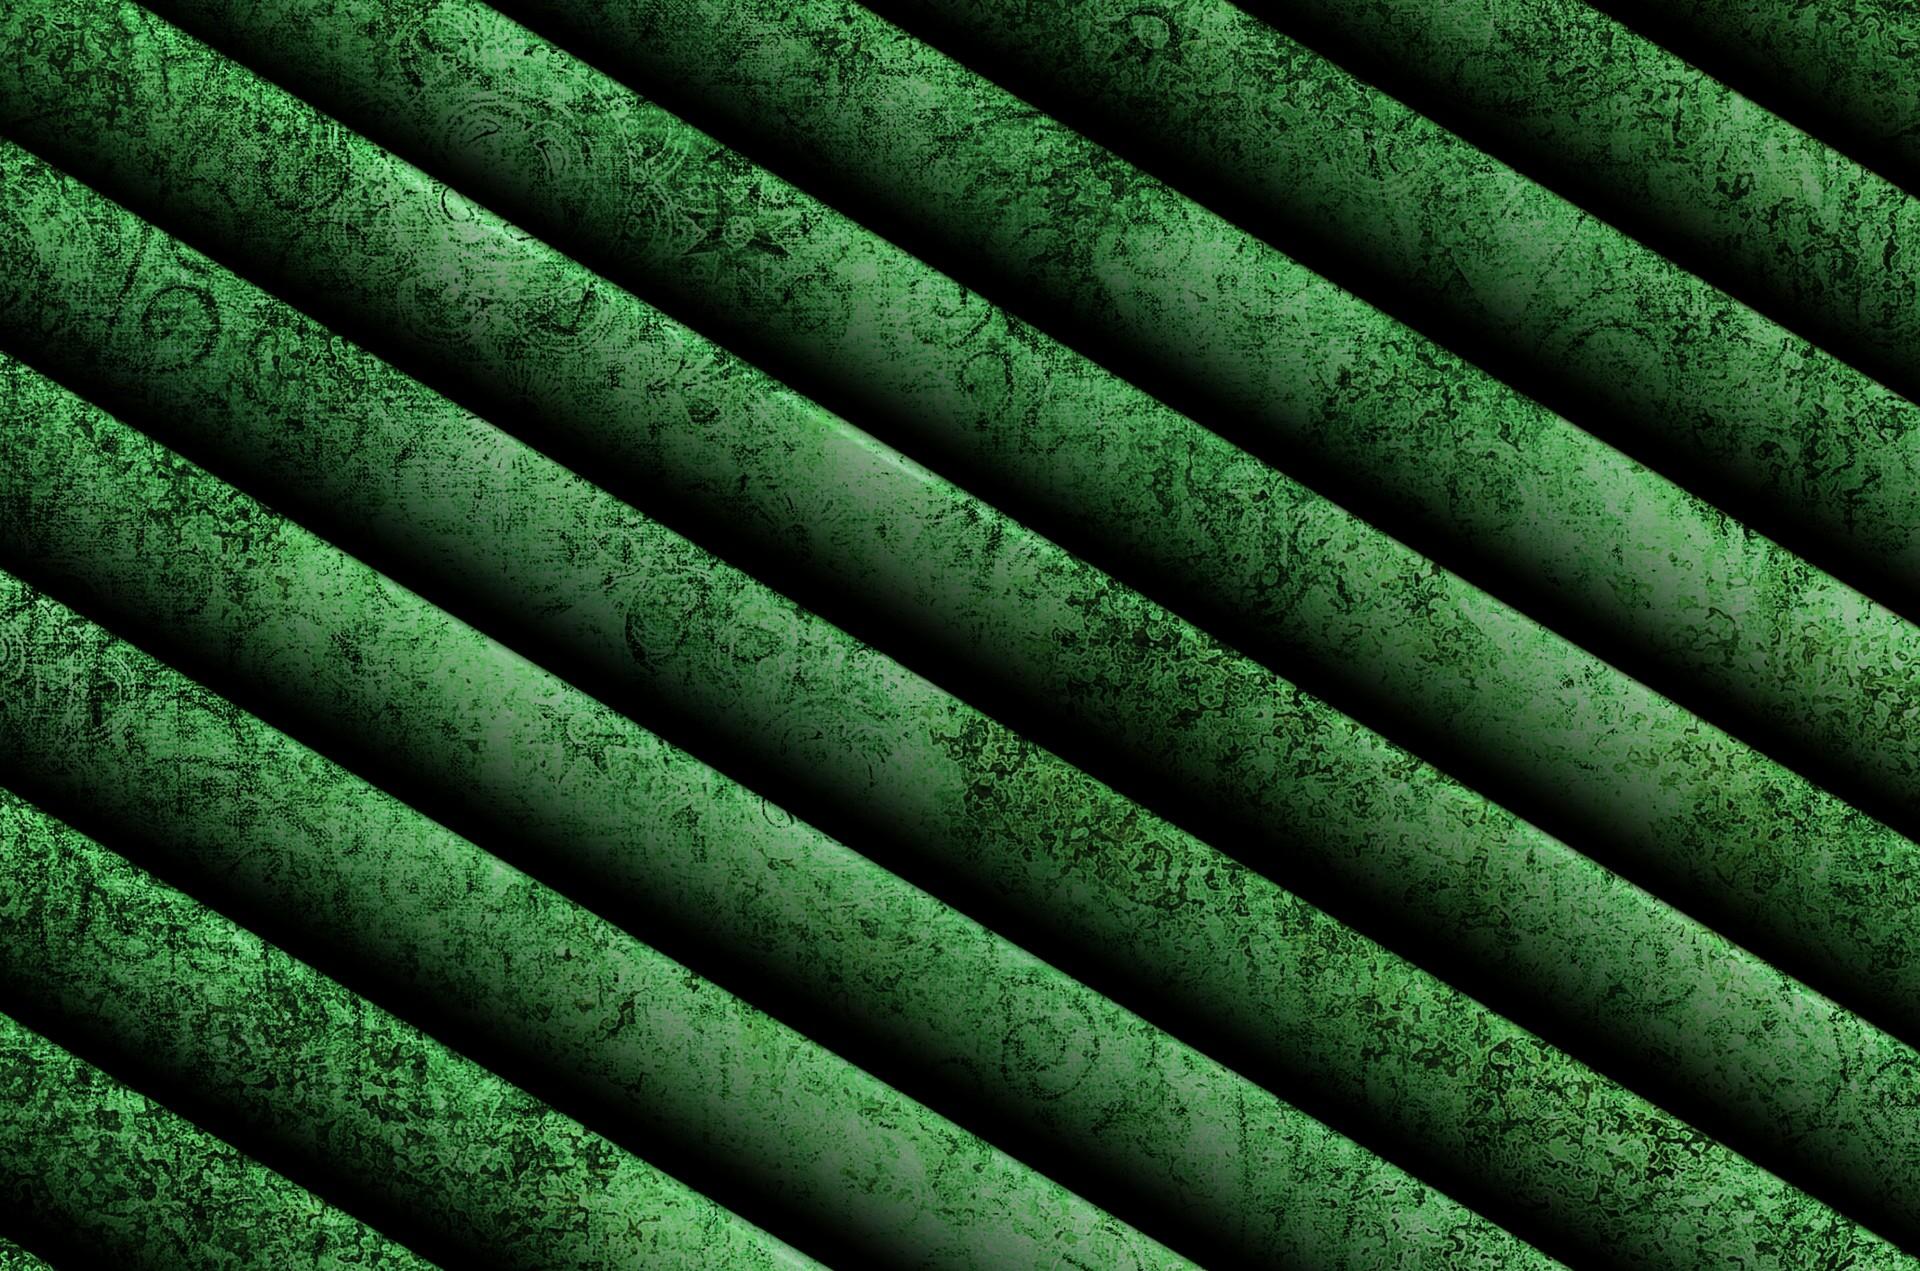 Black And Grey Wallpaper Green Diagonal Grunge Background Free Stock Photo Public